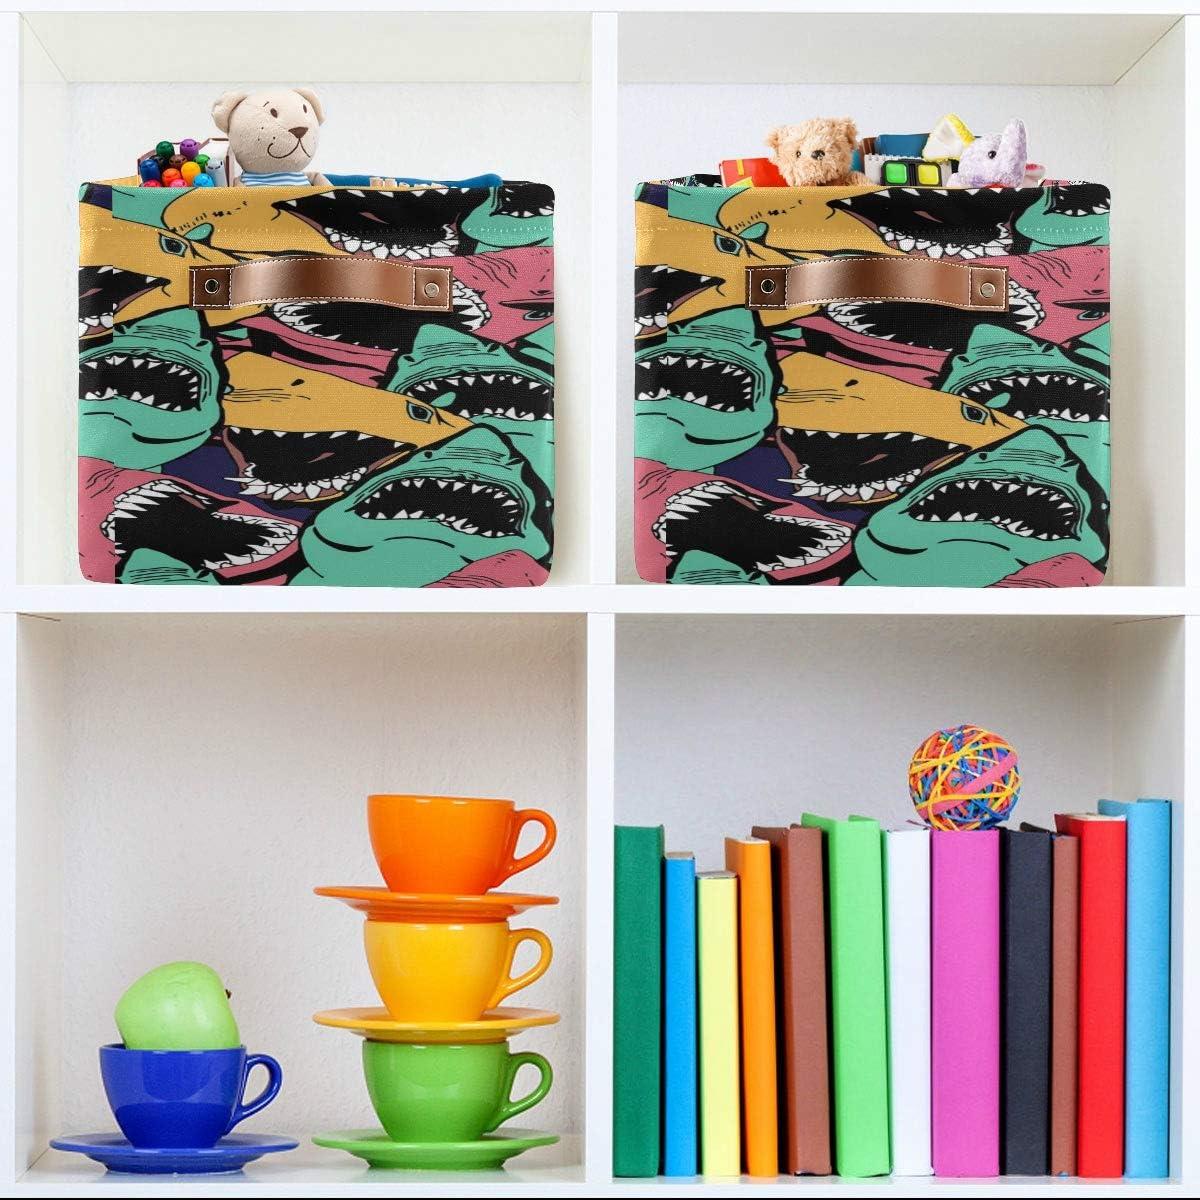 BIGJOKE Animal Wild Wolf Print Storage Basket Cube Toy Storage Bin Clothes Basket Collapsible with Handles Fabric Storage Basket for Shelf Nursery Home Closet /& Office